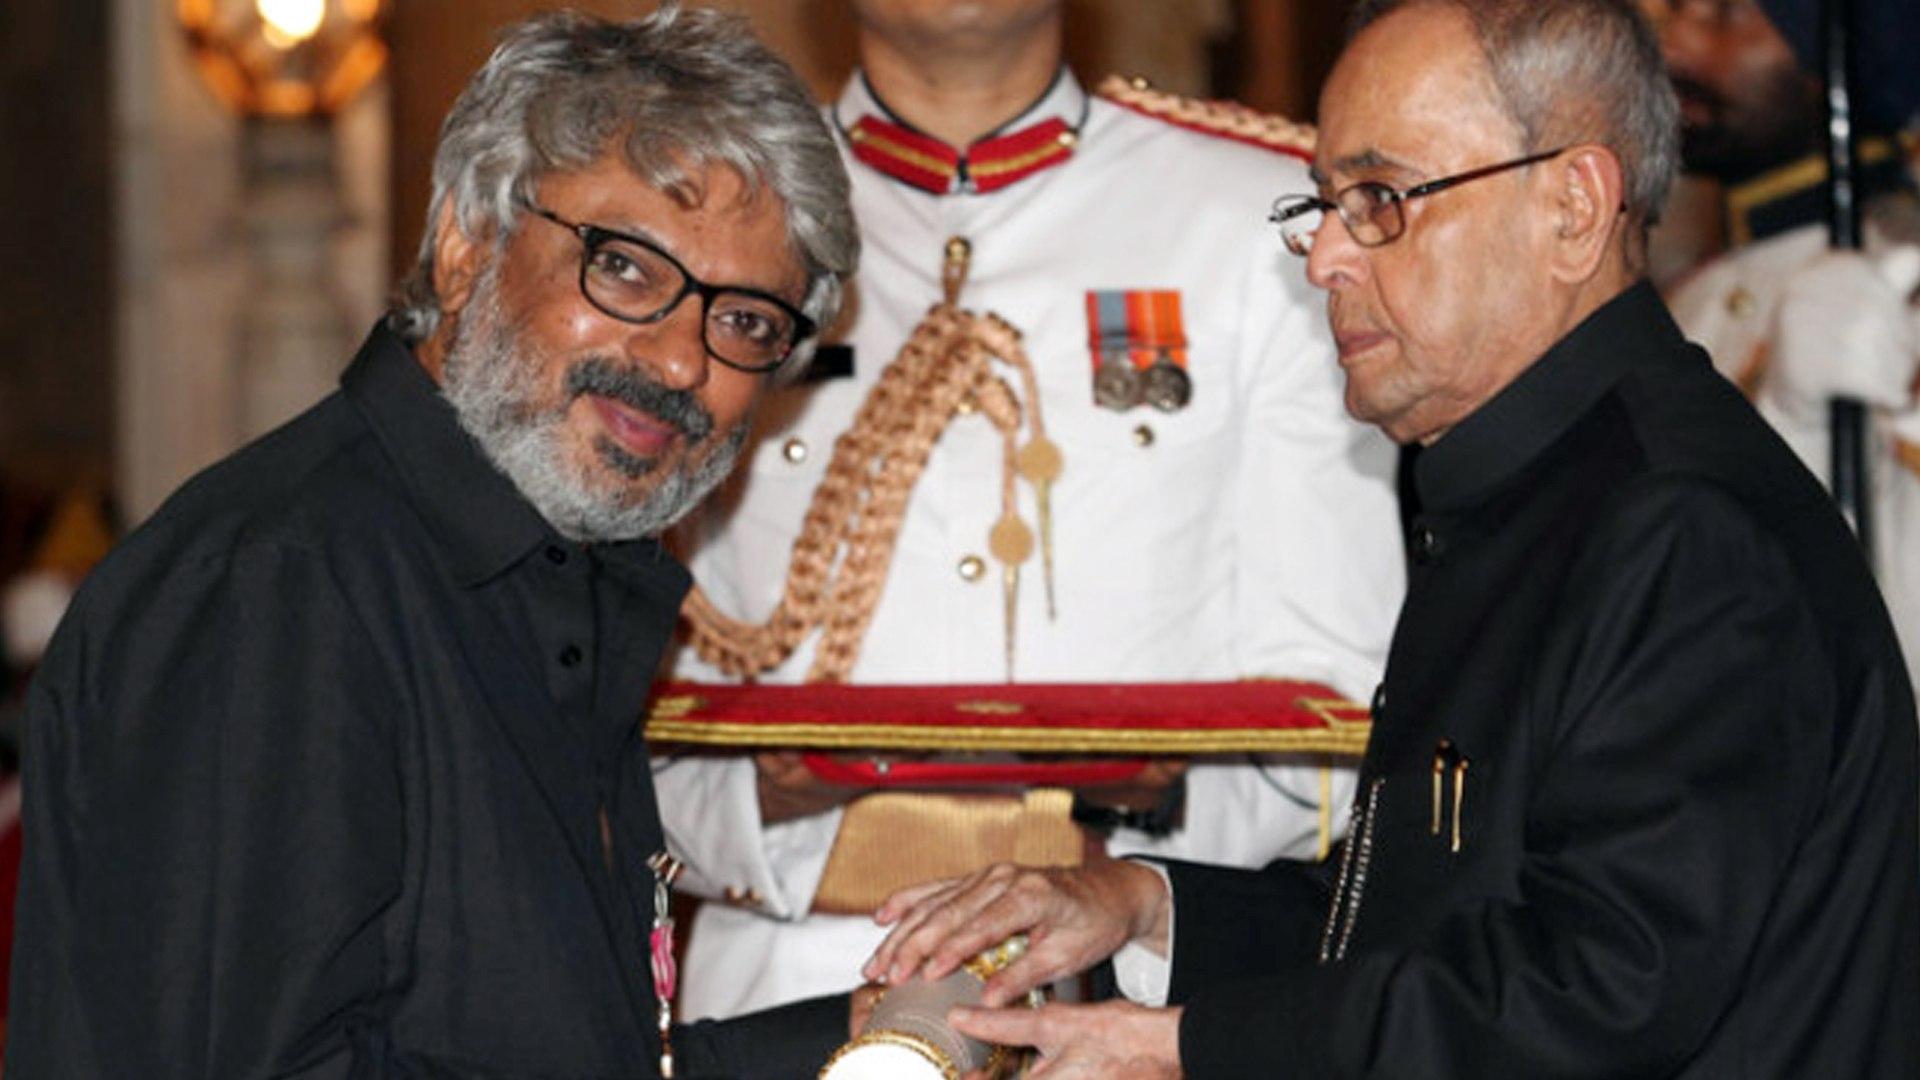 Sanjay Leela Bhansali Receives PADMASHRI AWARD - video Dailymotion